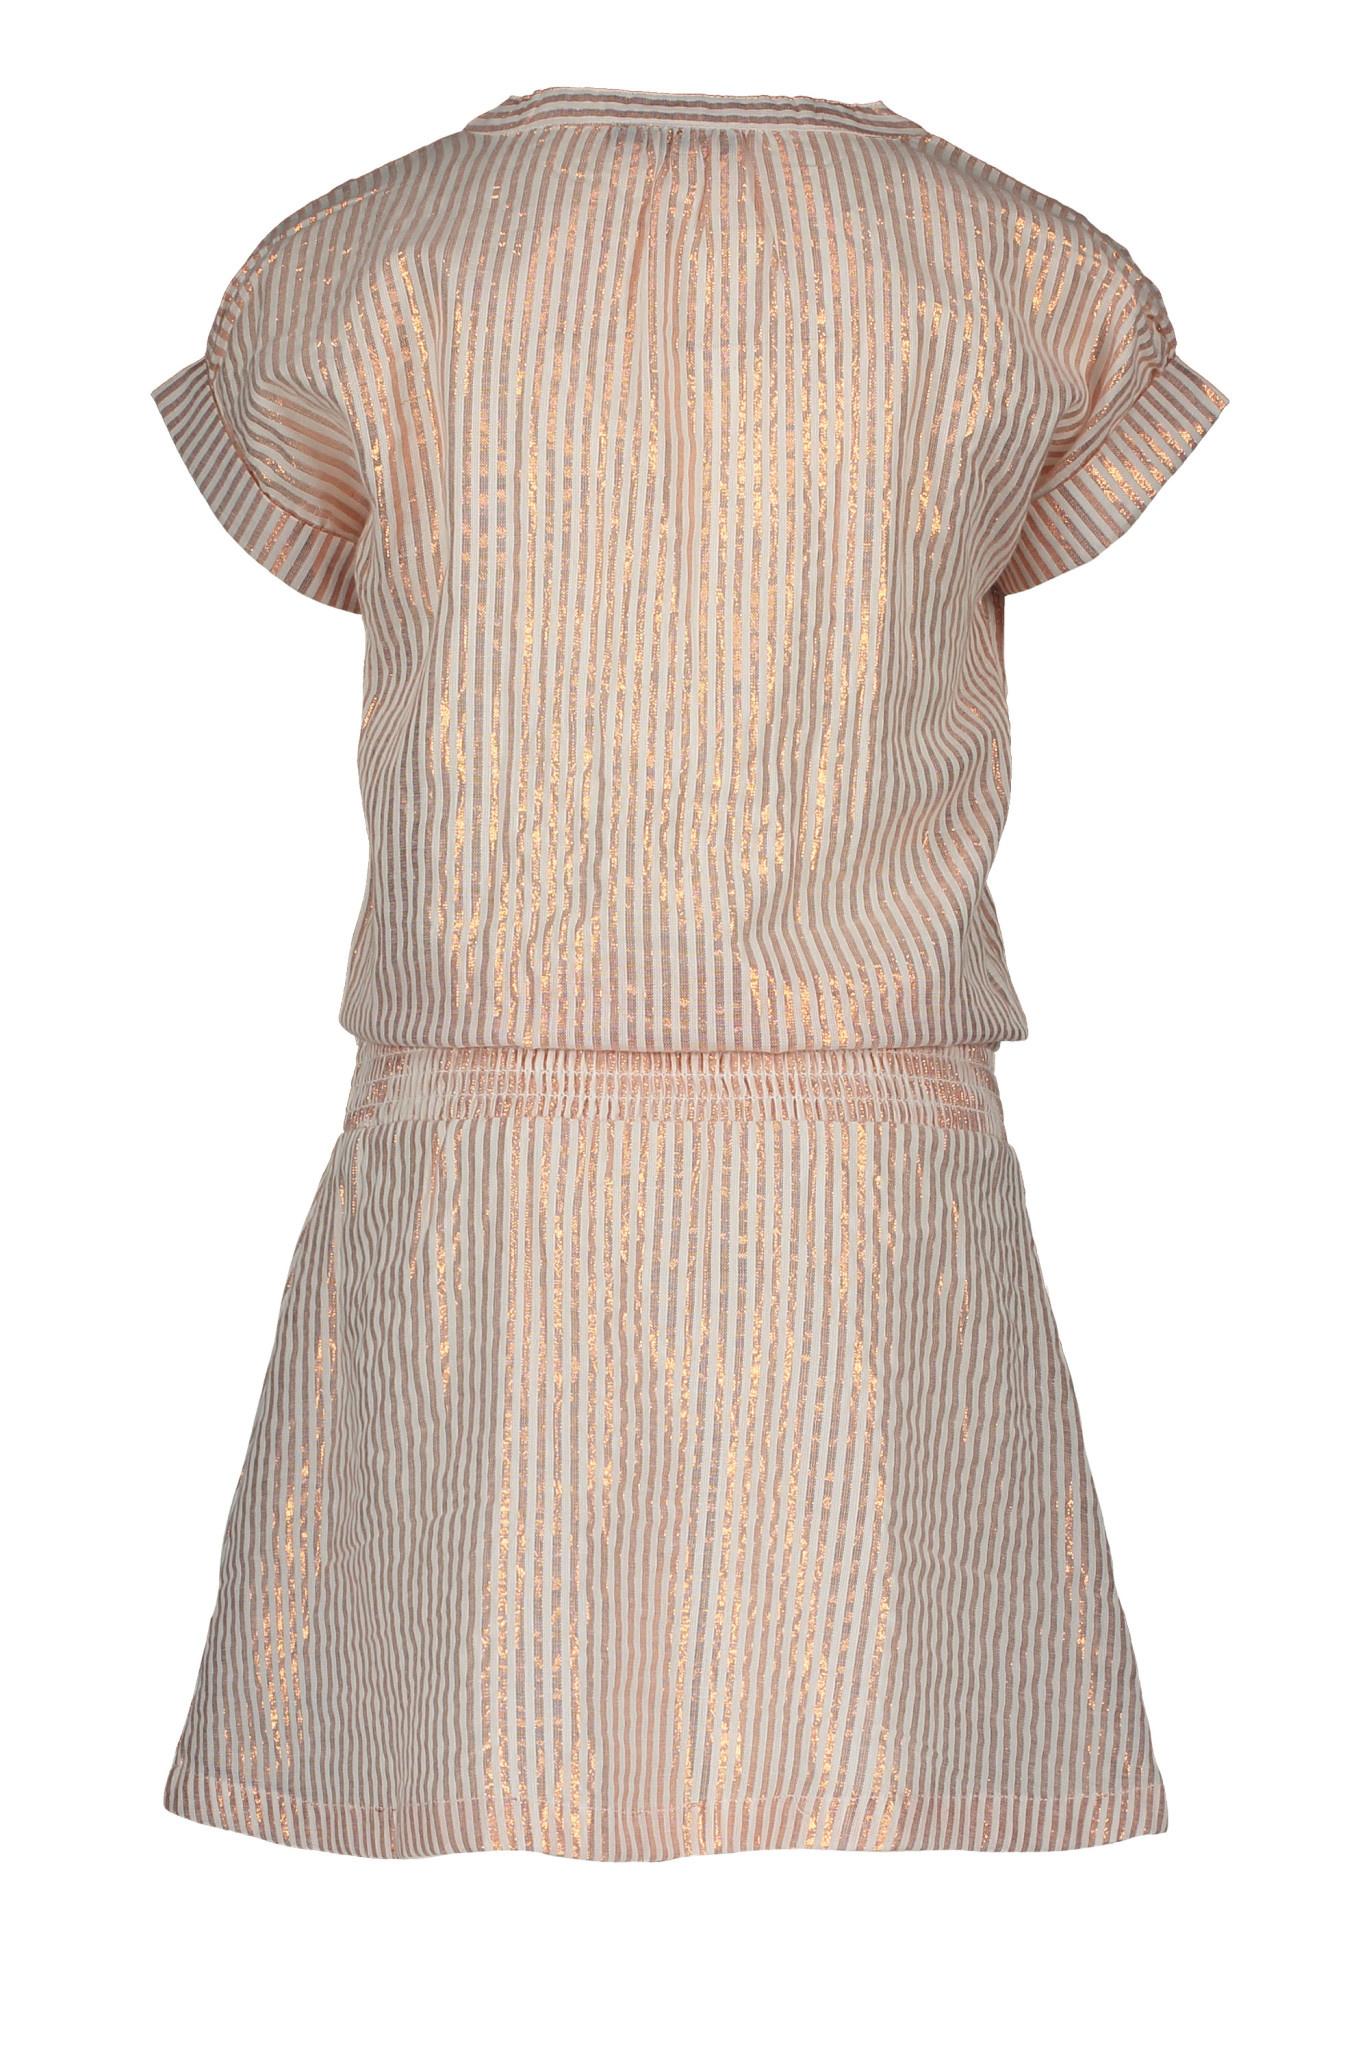 Like Flo Lurex Stripe Dress